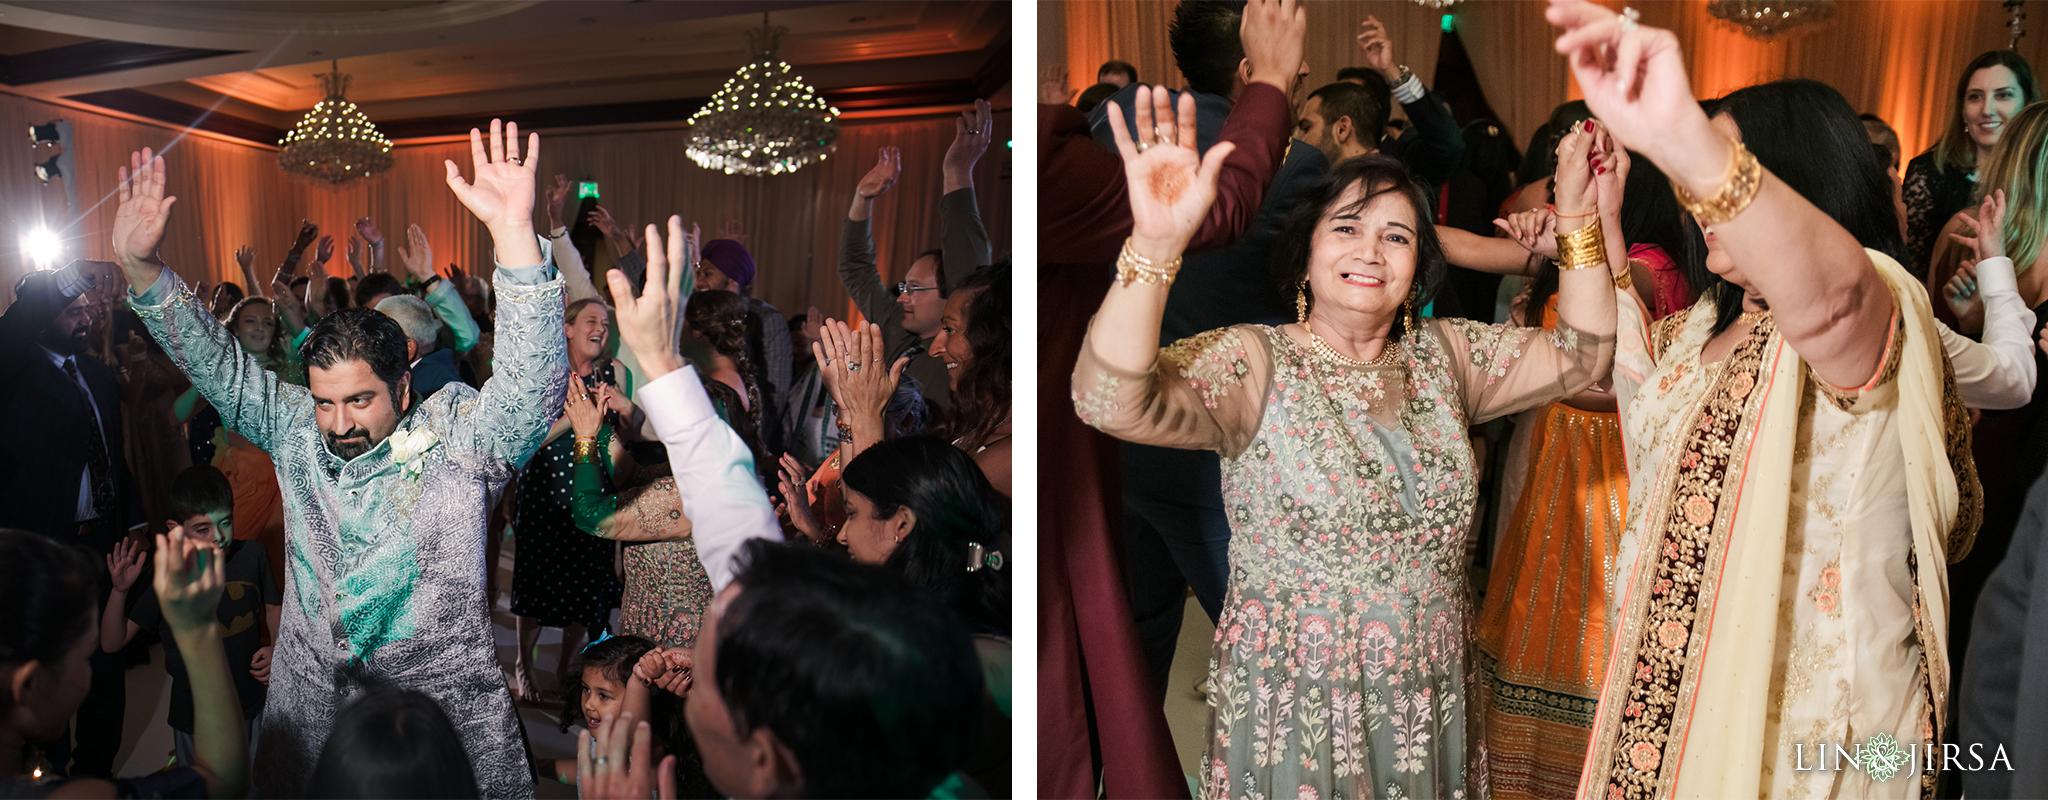 32 Four Seasons Westlake Village Indian Wedding Photographer